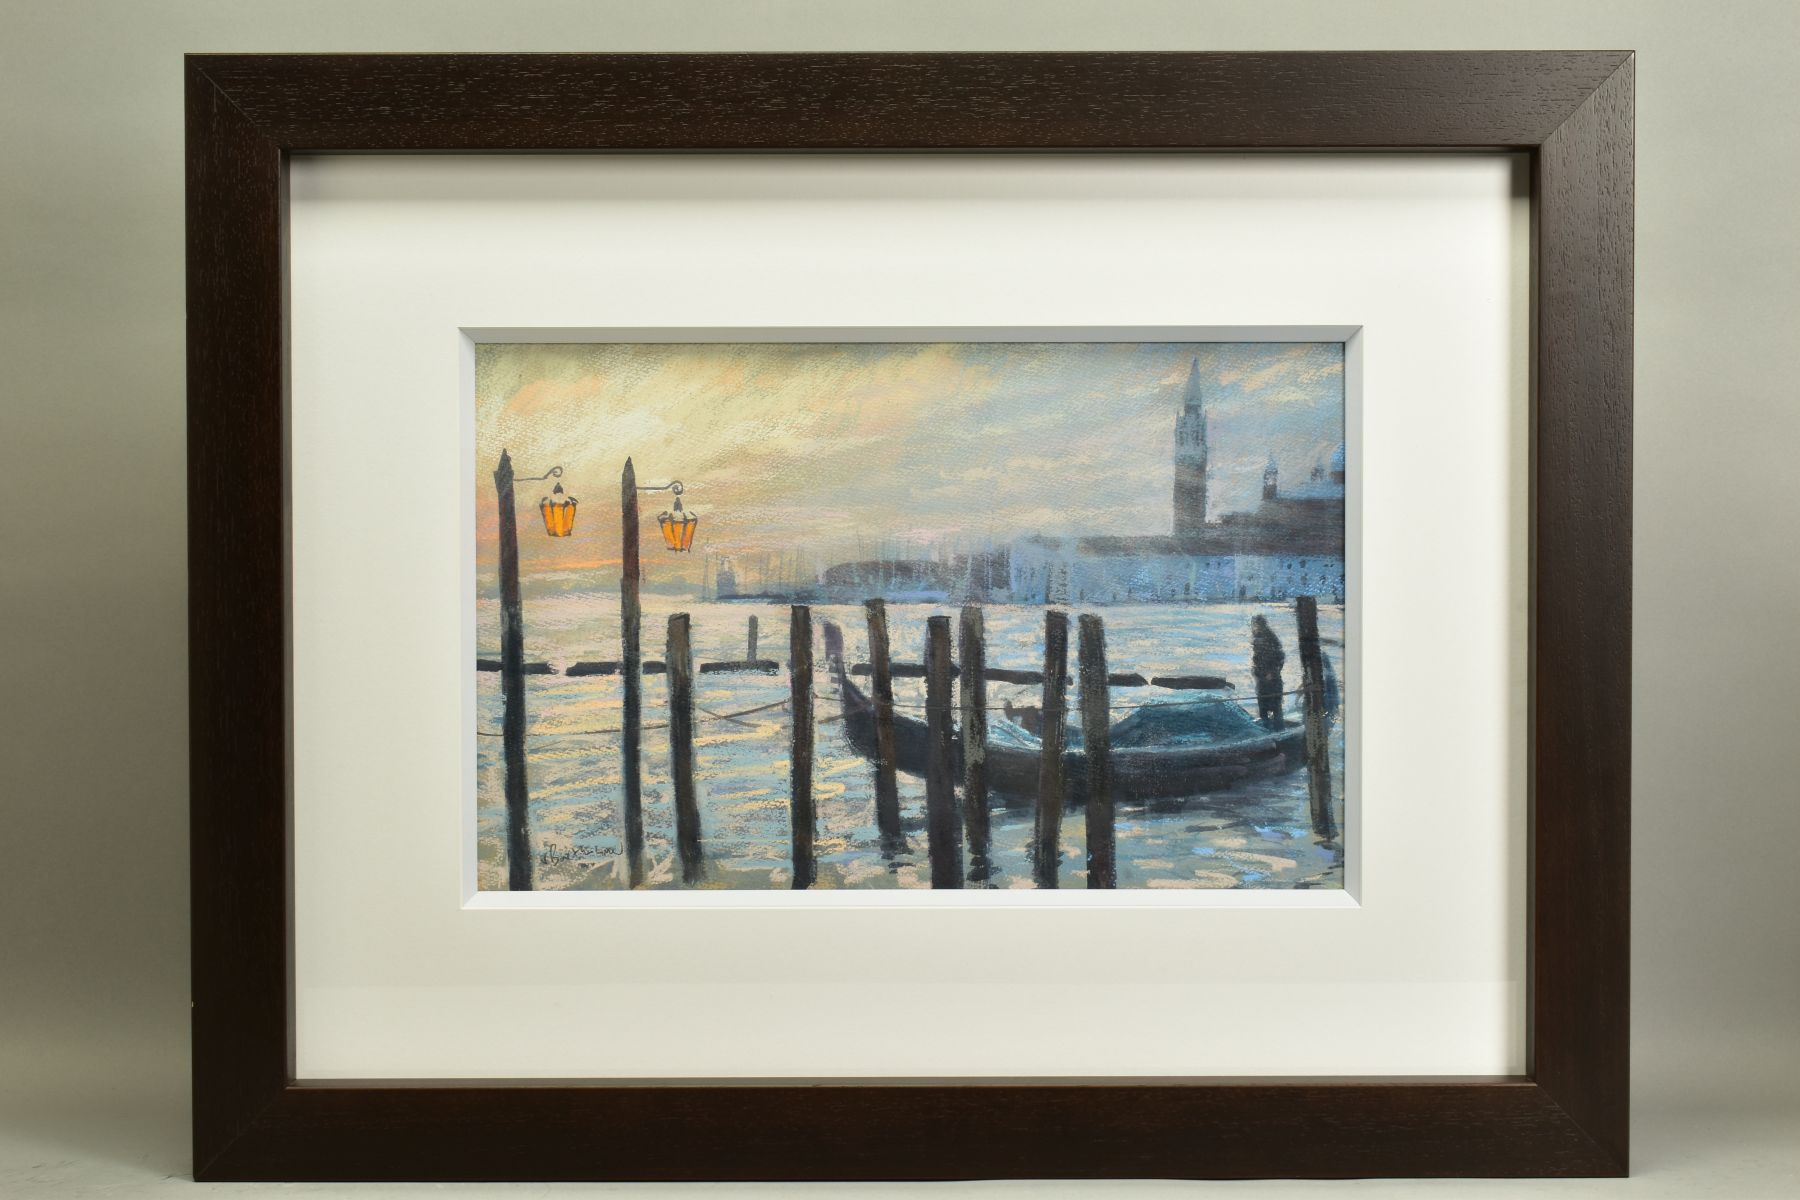 JAMES BARTHOLOMEW (BRITISH CONTEMPORARY), 'Towards San Giorgio, First Light', a Venetian scene